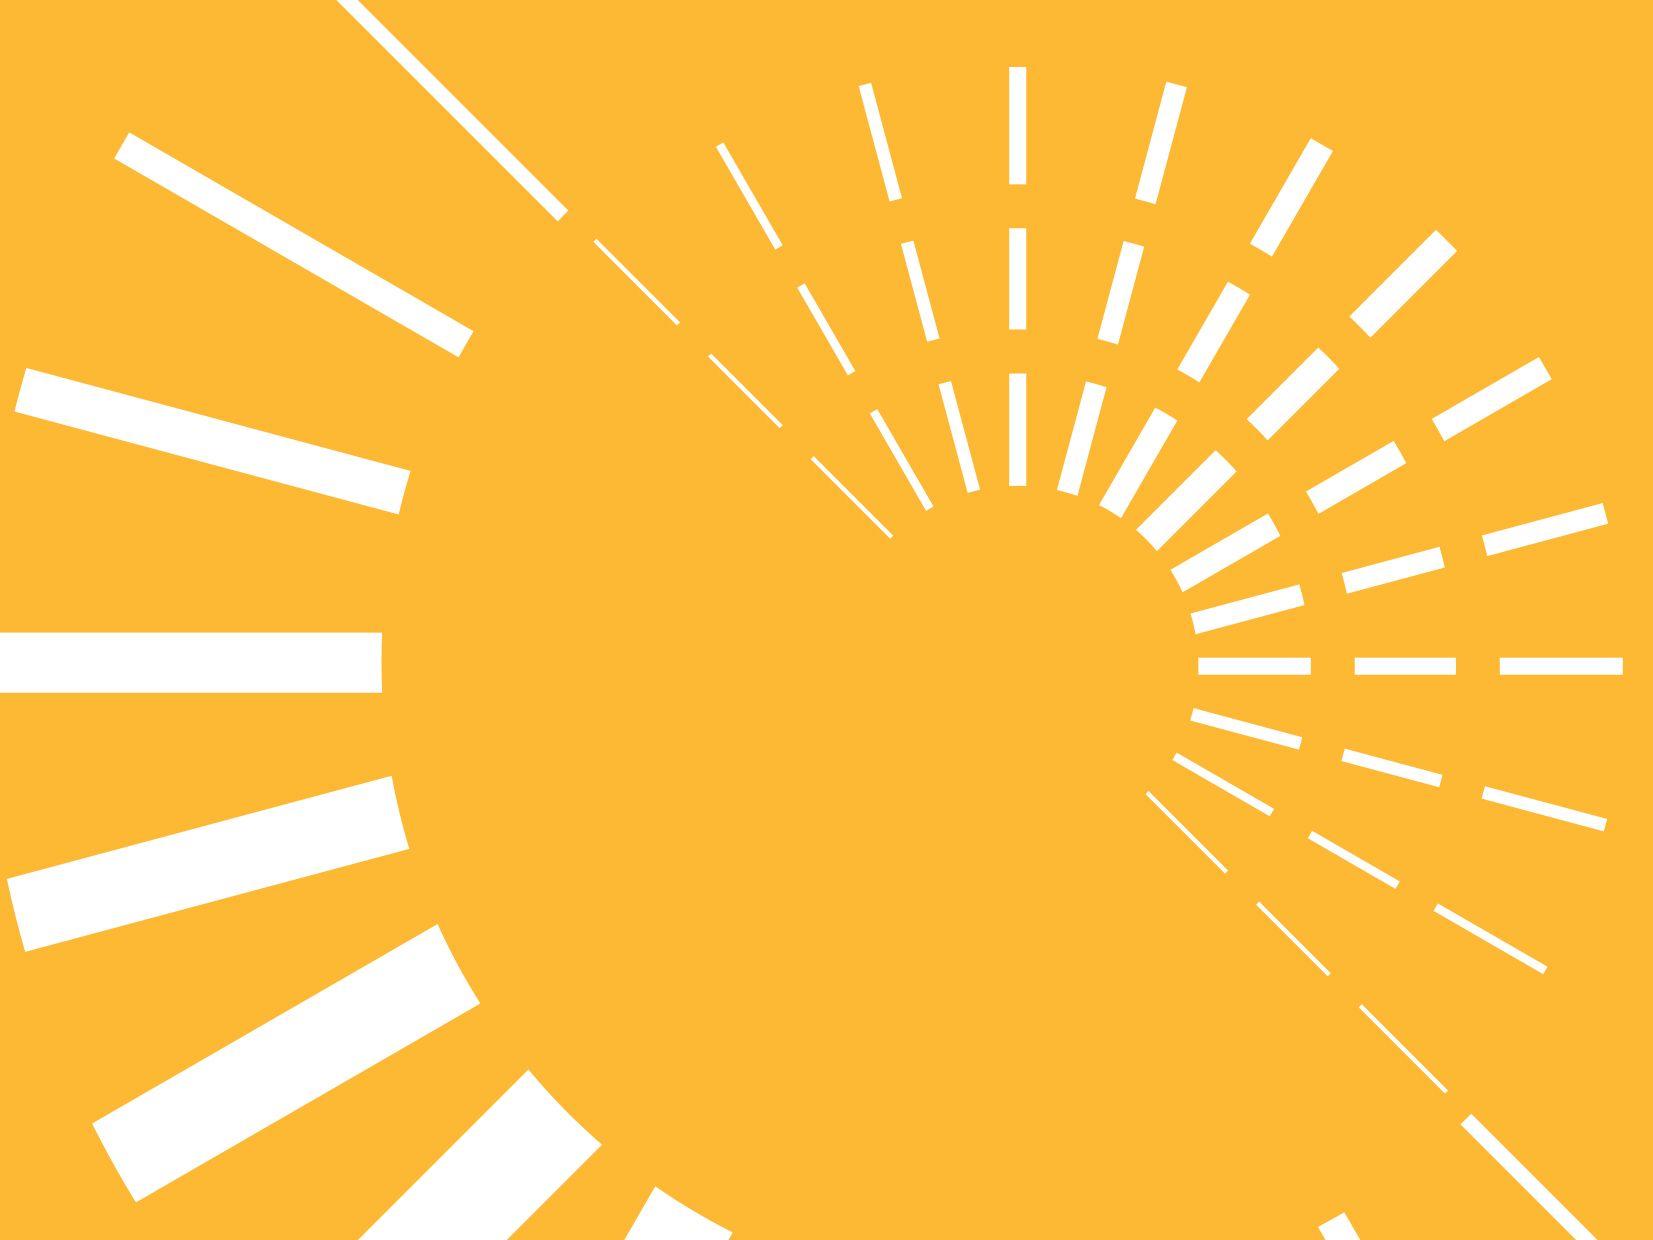 Decorative image of dashed white circles on yellow background